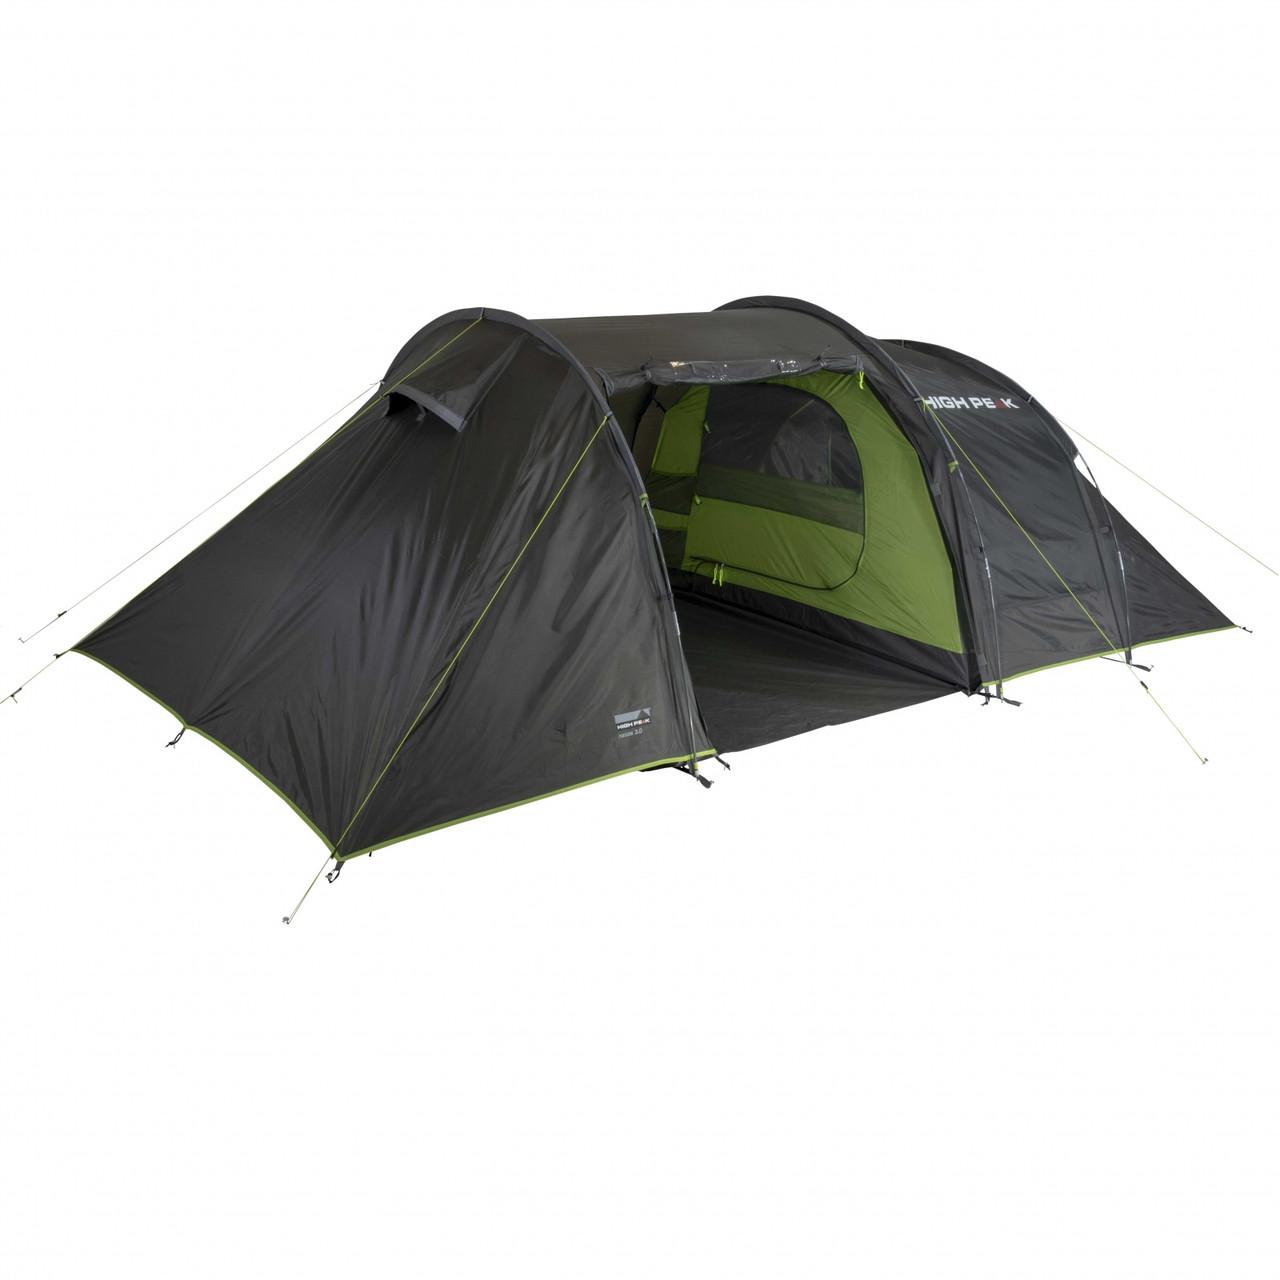 Палатка High Peak Naxos 3.0 (Dark Grey/Green) R89028